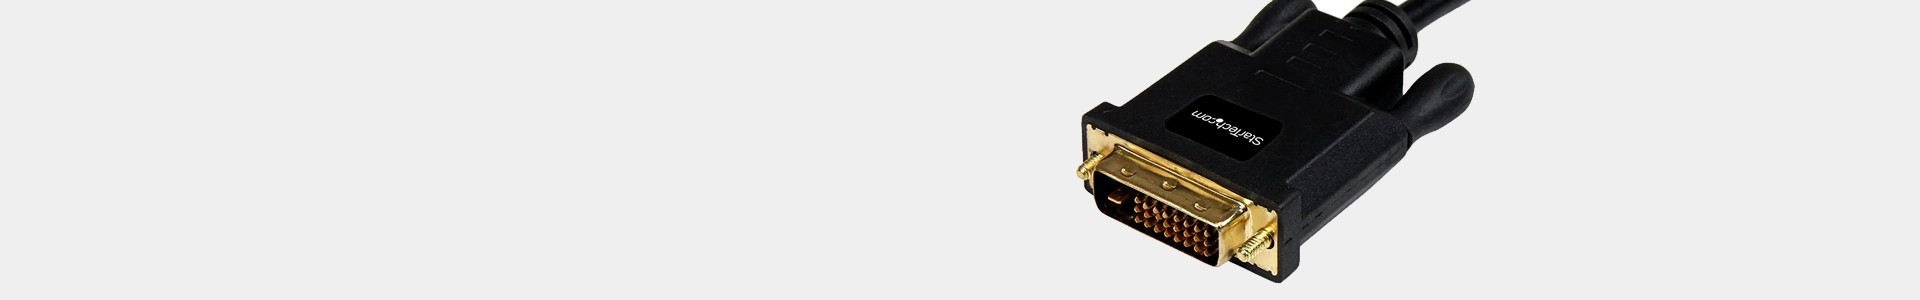 Extensores DVI por CAT o fibra óptica   Equipos profesionales - Avacab